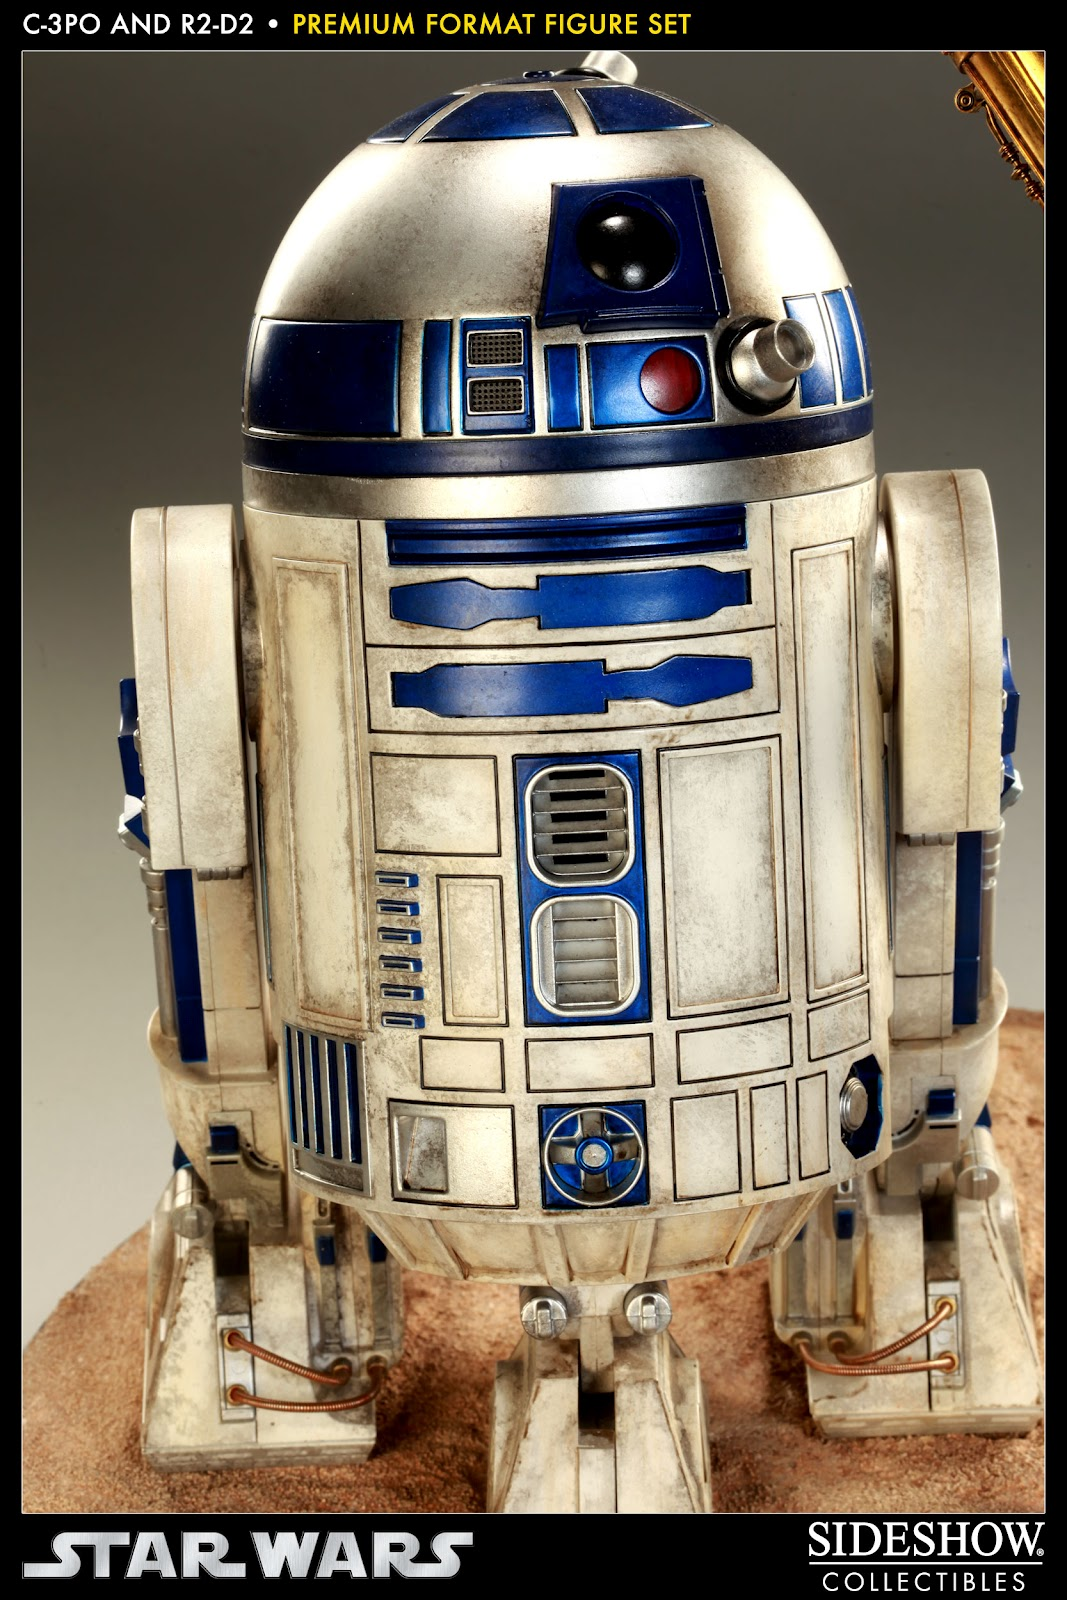 R2d2 And C3po Toys : Star wars c po r d premium format figure sg toys